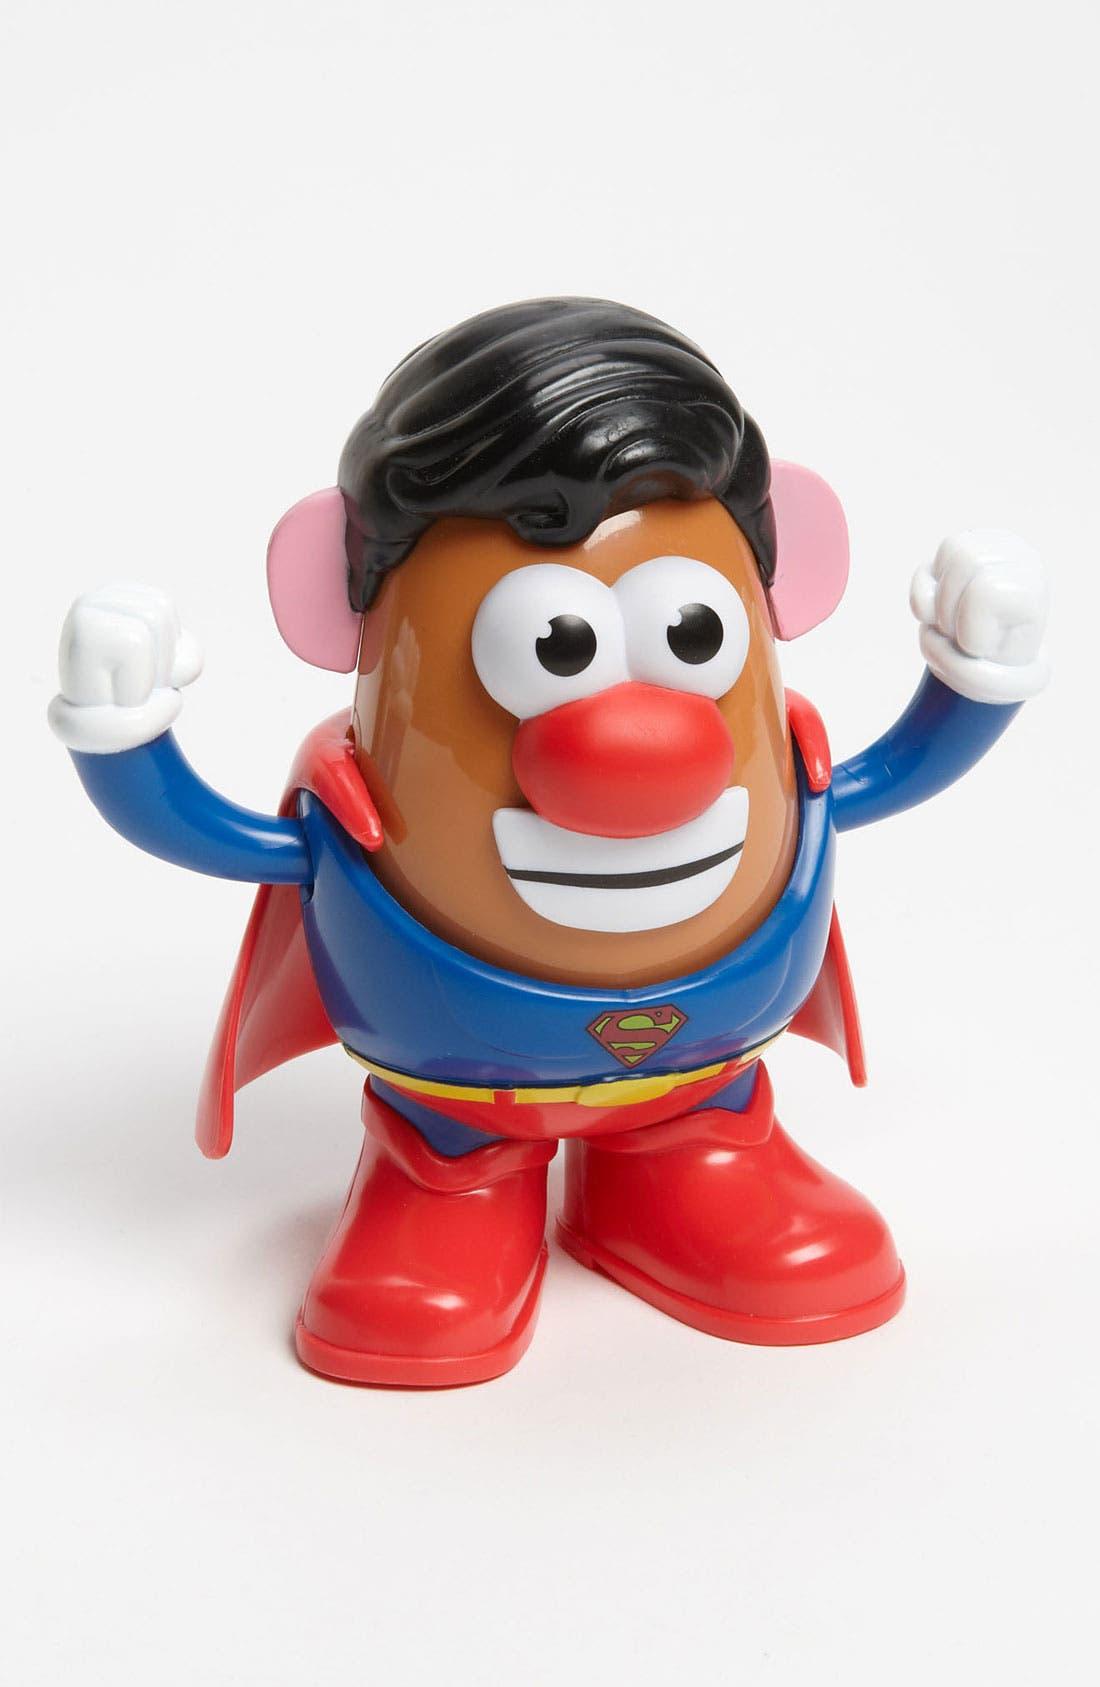 Alternate Image 1 Selected - Hasbro DC Comics 'Mr. Potato Head™' Toy